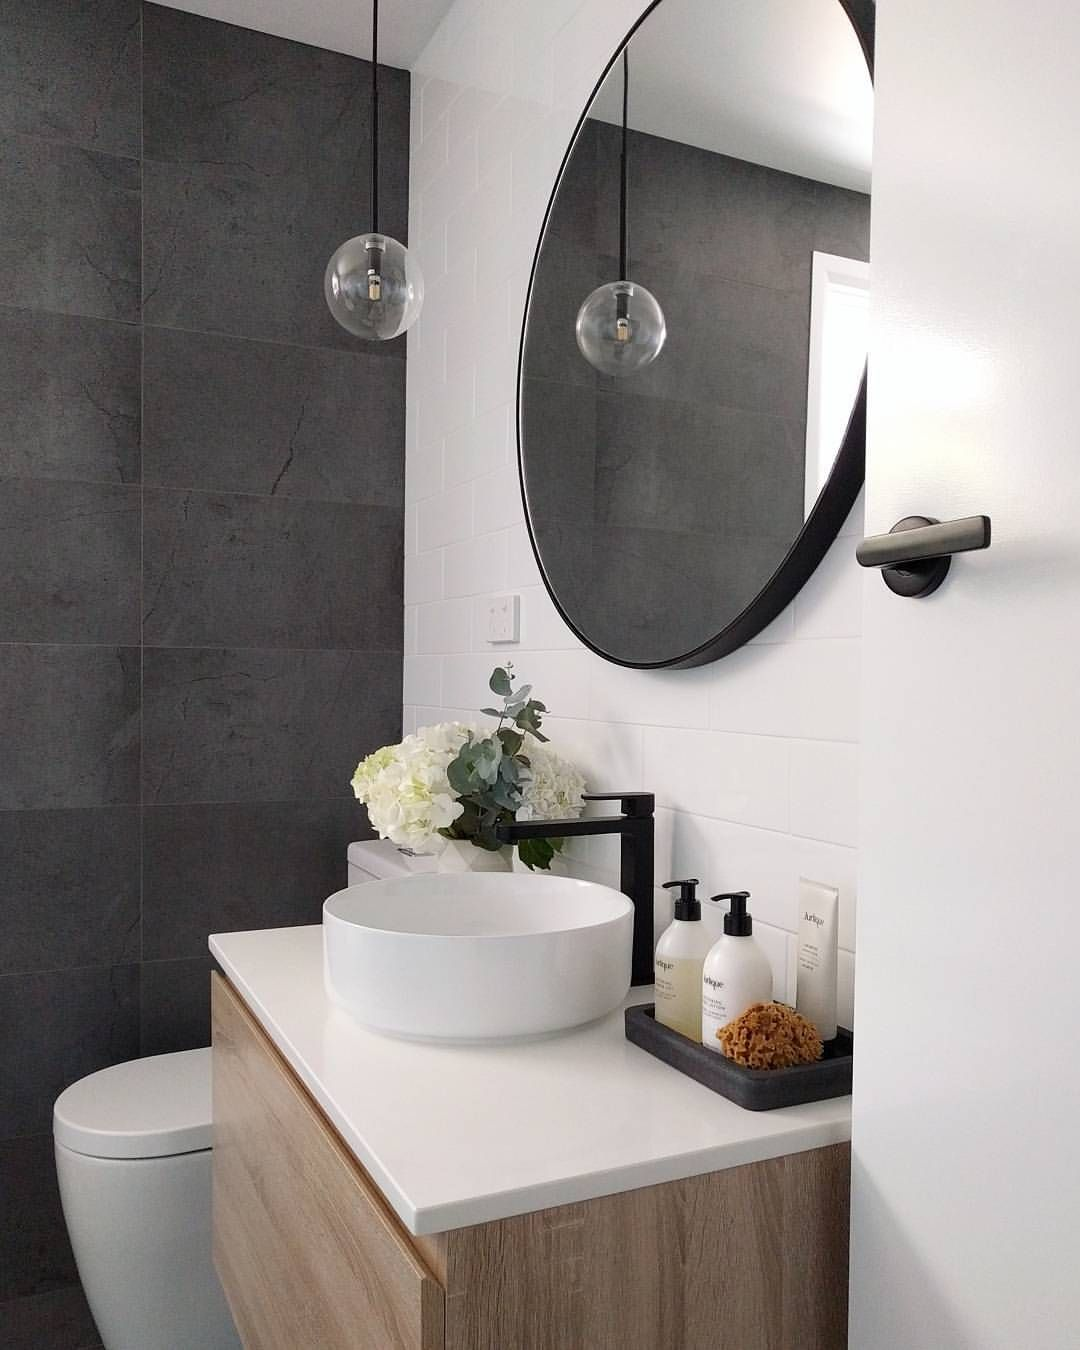 pin | bellaxlovee ✧☾ | Bañeras | Pinterest | Badezimmer, Hausbau ...